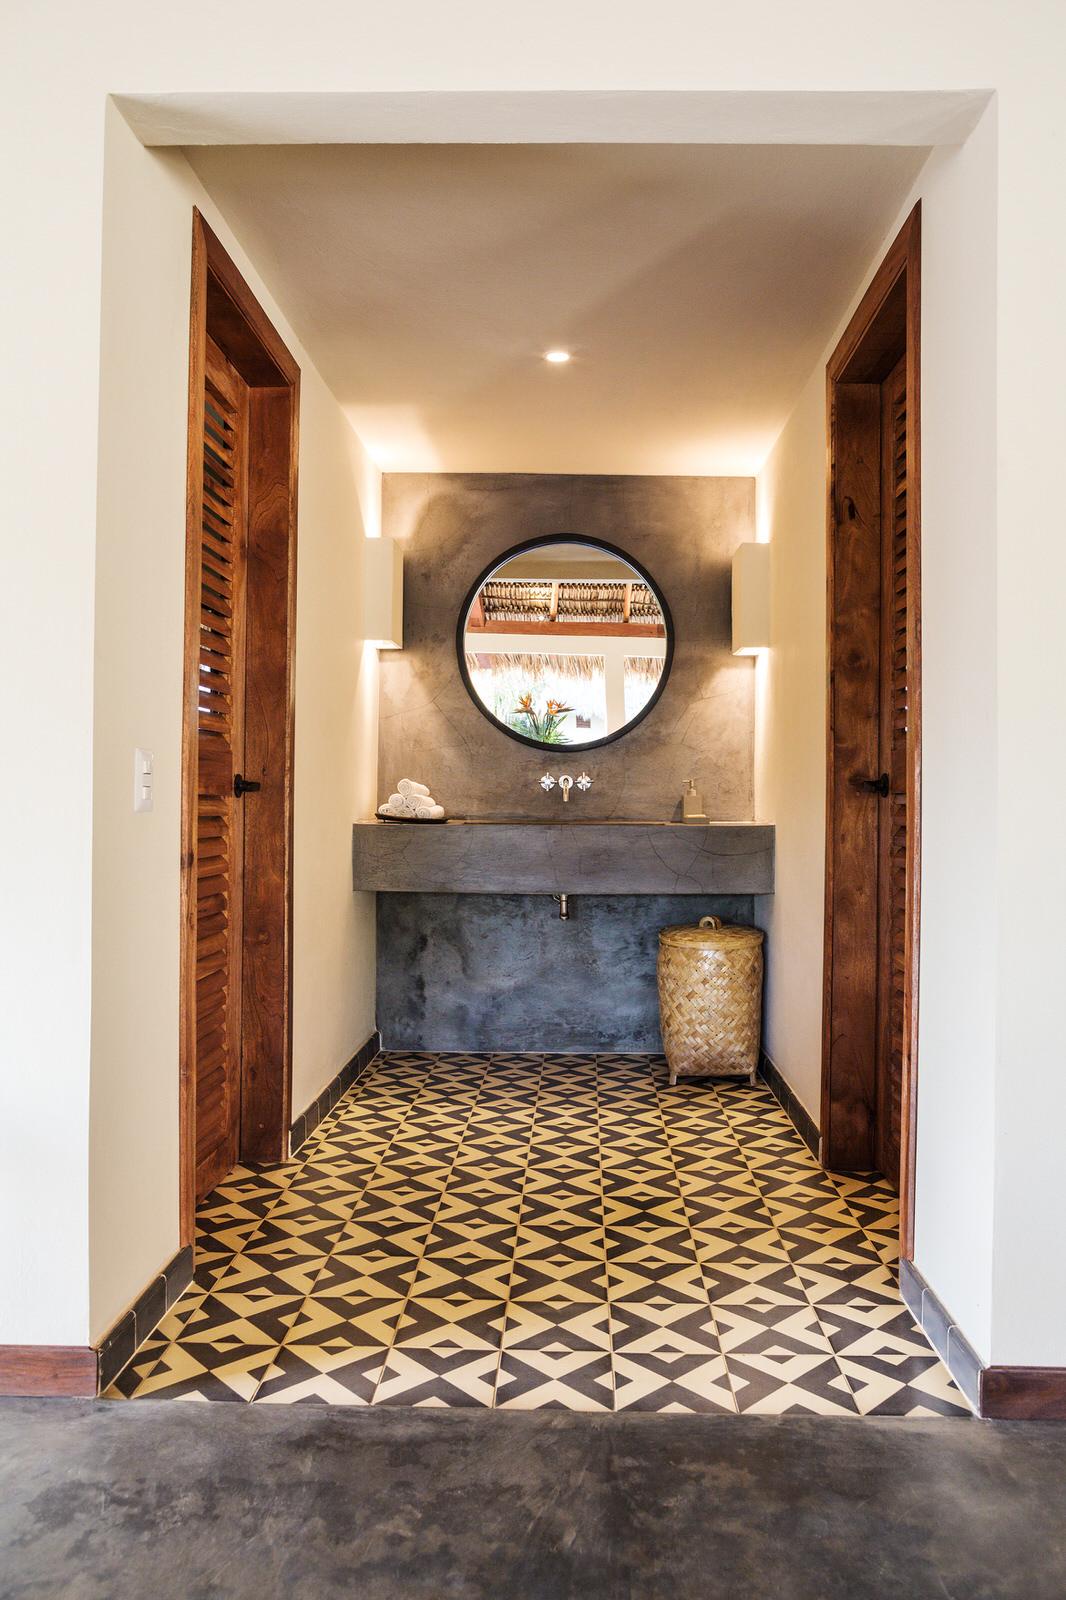 New Nicaragua Hotel Meson Nadi Includes Granada Tile